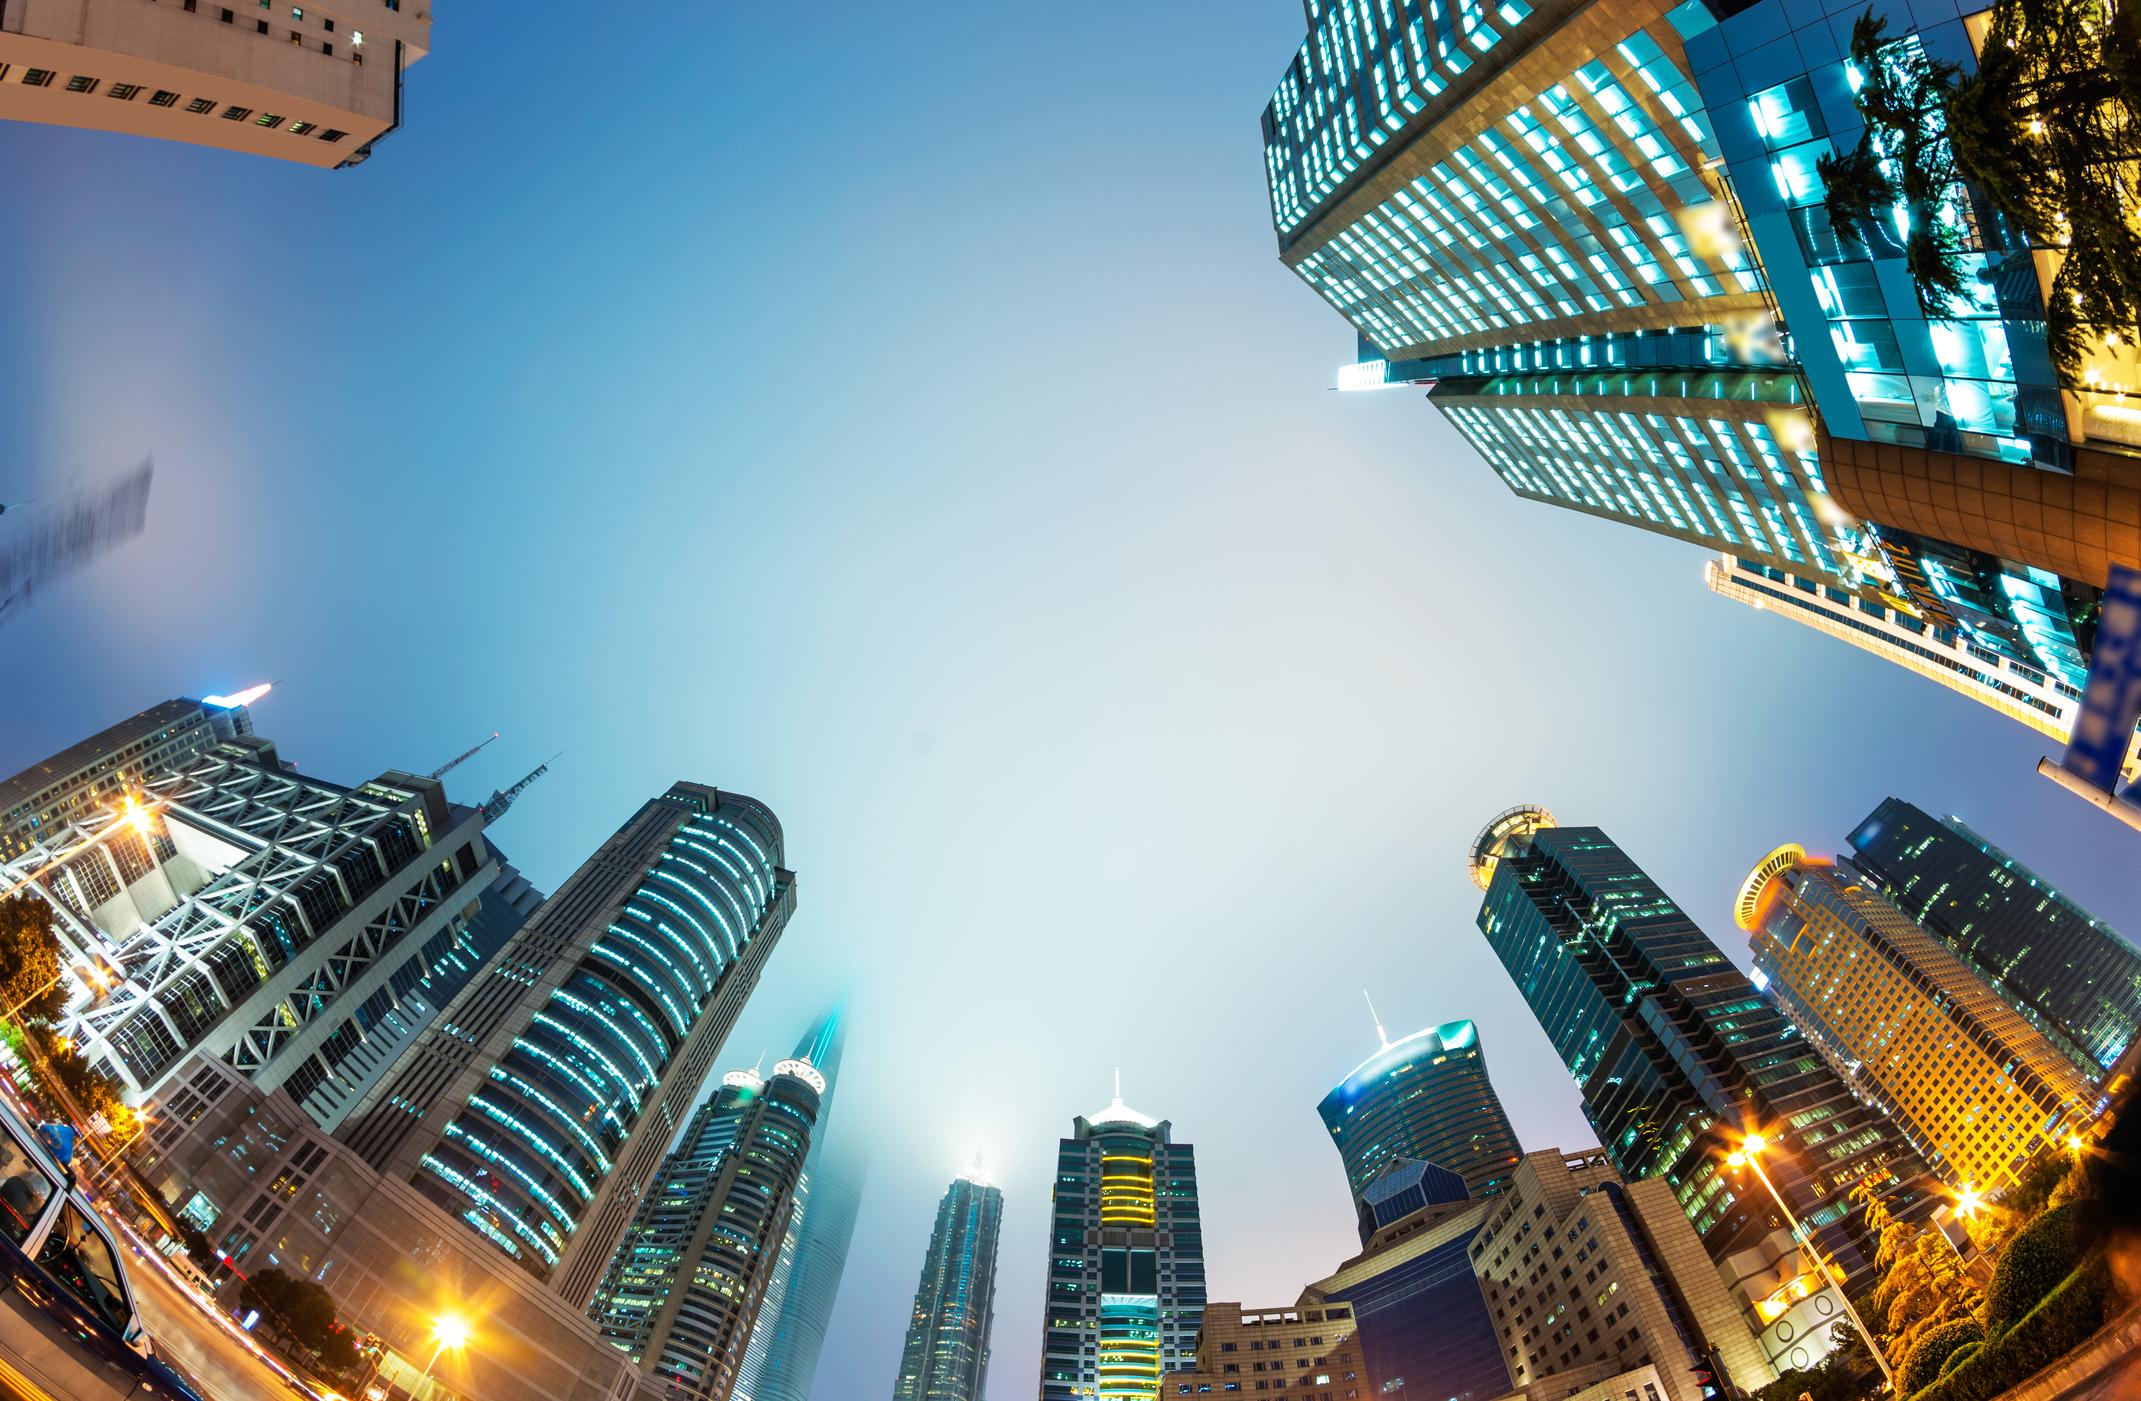 View of Shanghai skyscrapers